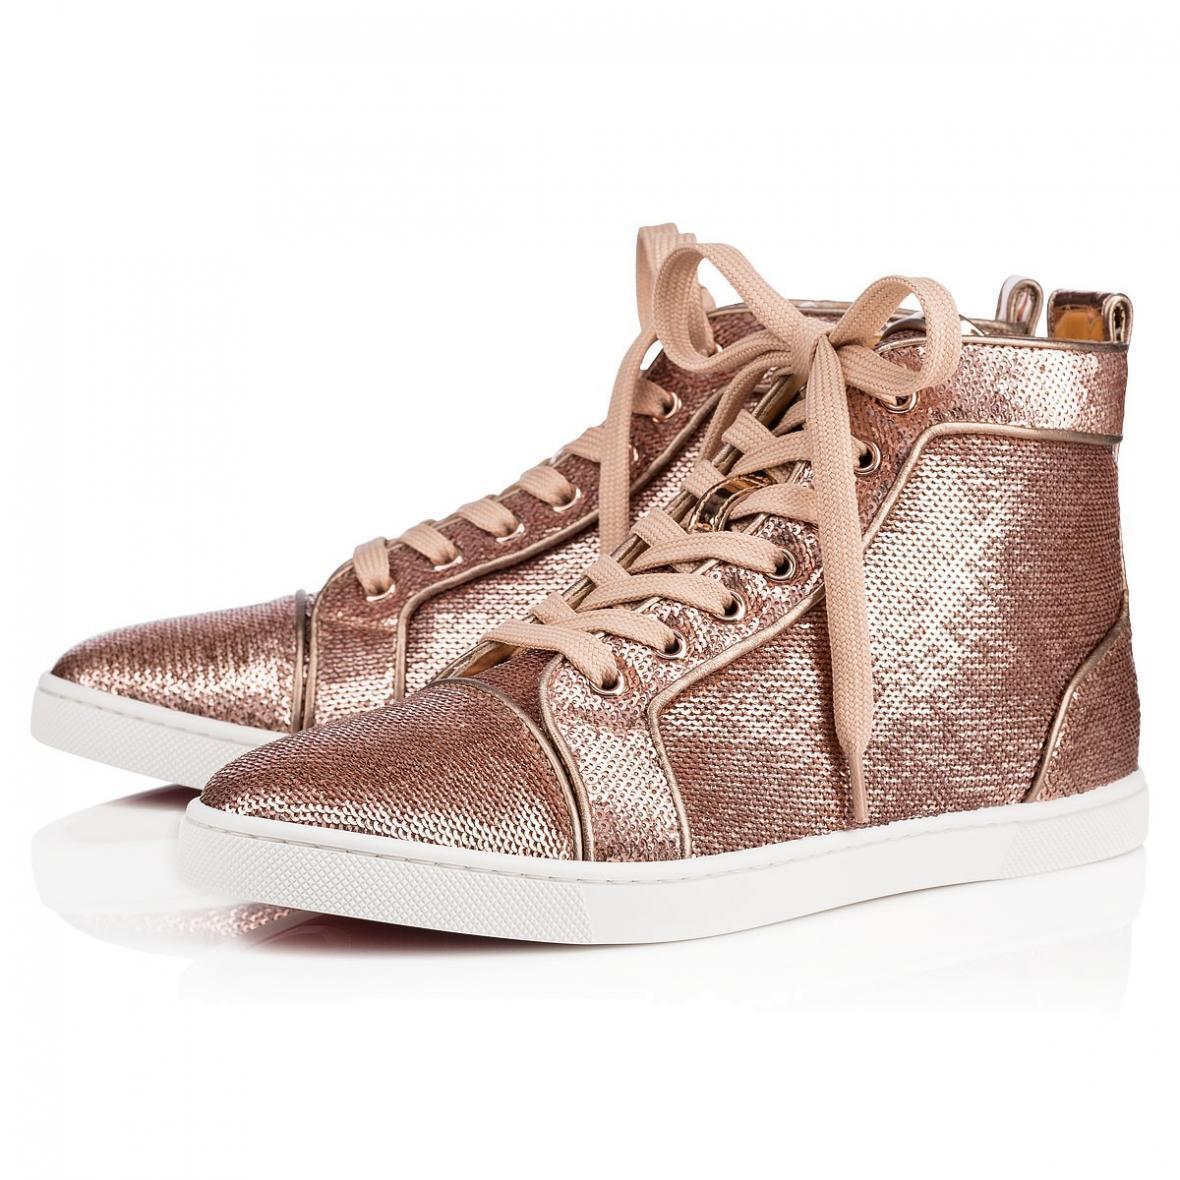 NB Louboutin Christian Louboutin NB Bip Bip Orlato Flat Nude Pink Sequin Hightop Sneaker 37.5 8170e0